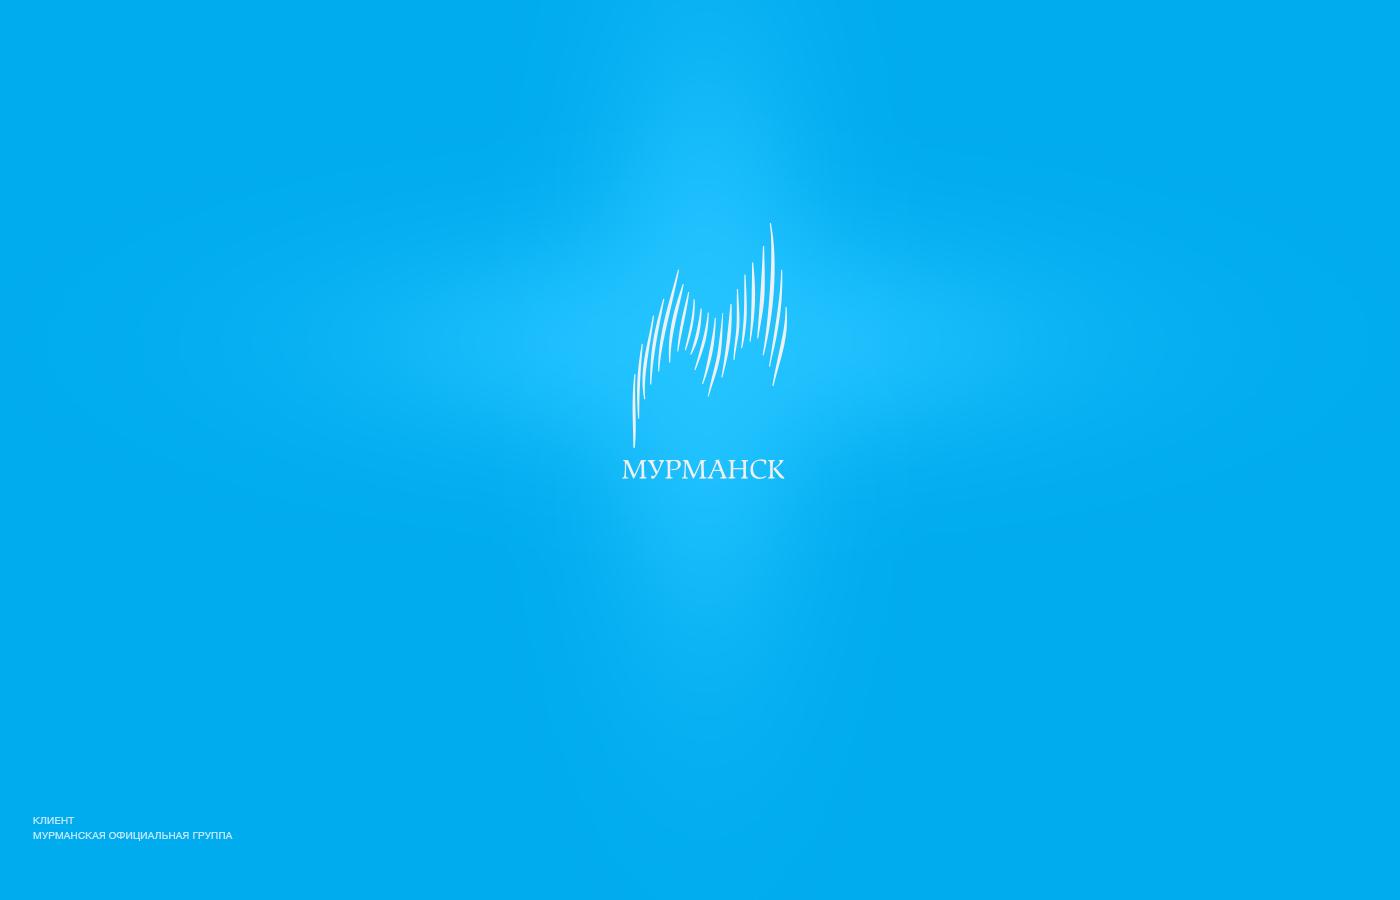 логотип, дизайн, спецтехника, бренд, брендинг, brand, logo, design, turbion, логотип мурманск, регион, область, москва, бренд города, город, образ